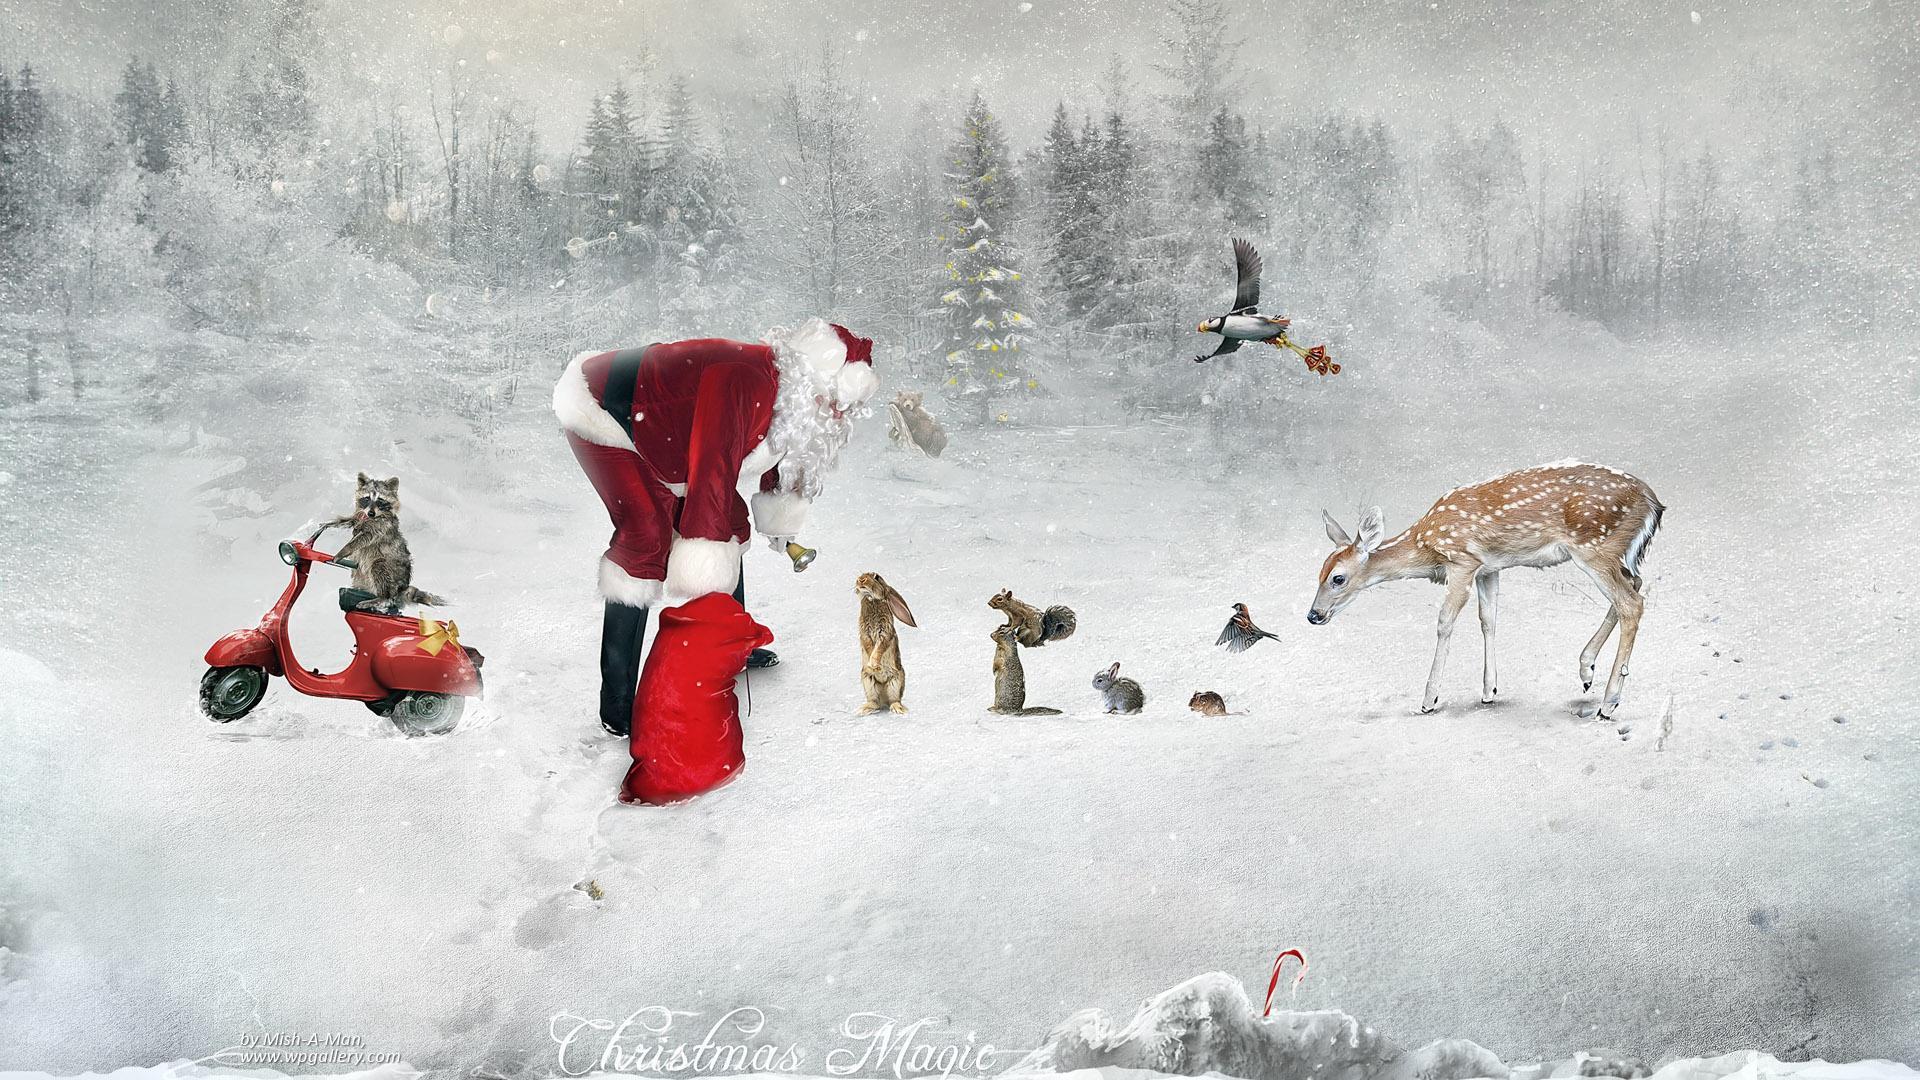 Christmas Magic Hd Wallpapers: Christmas Magic HD Wallpaper